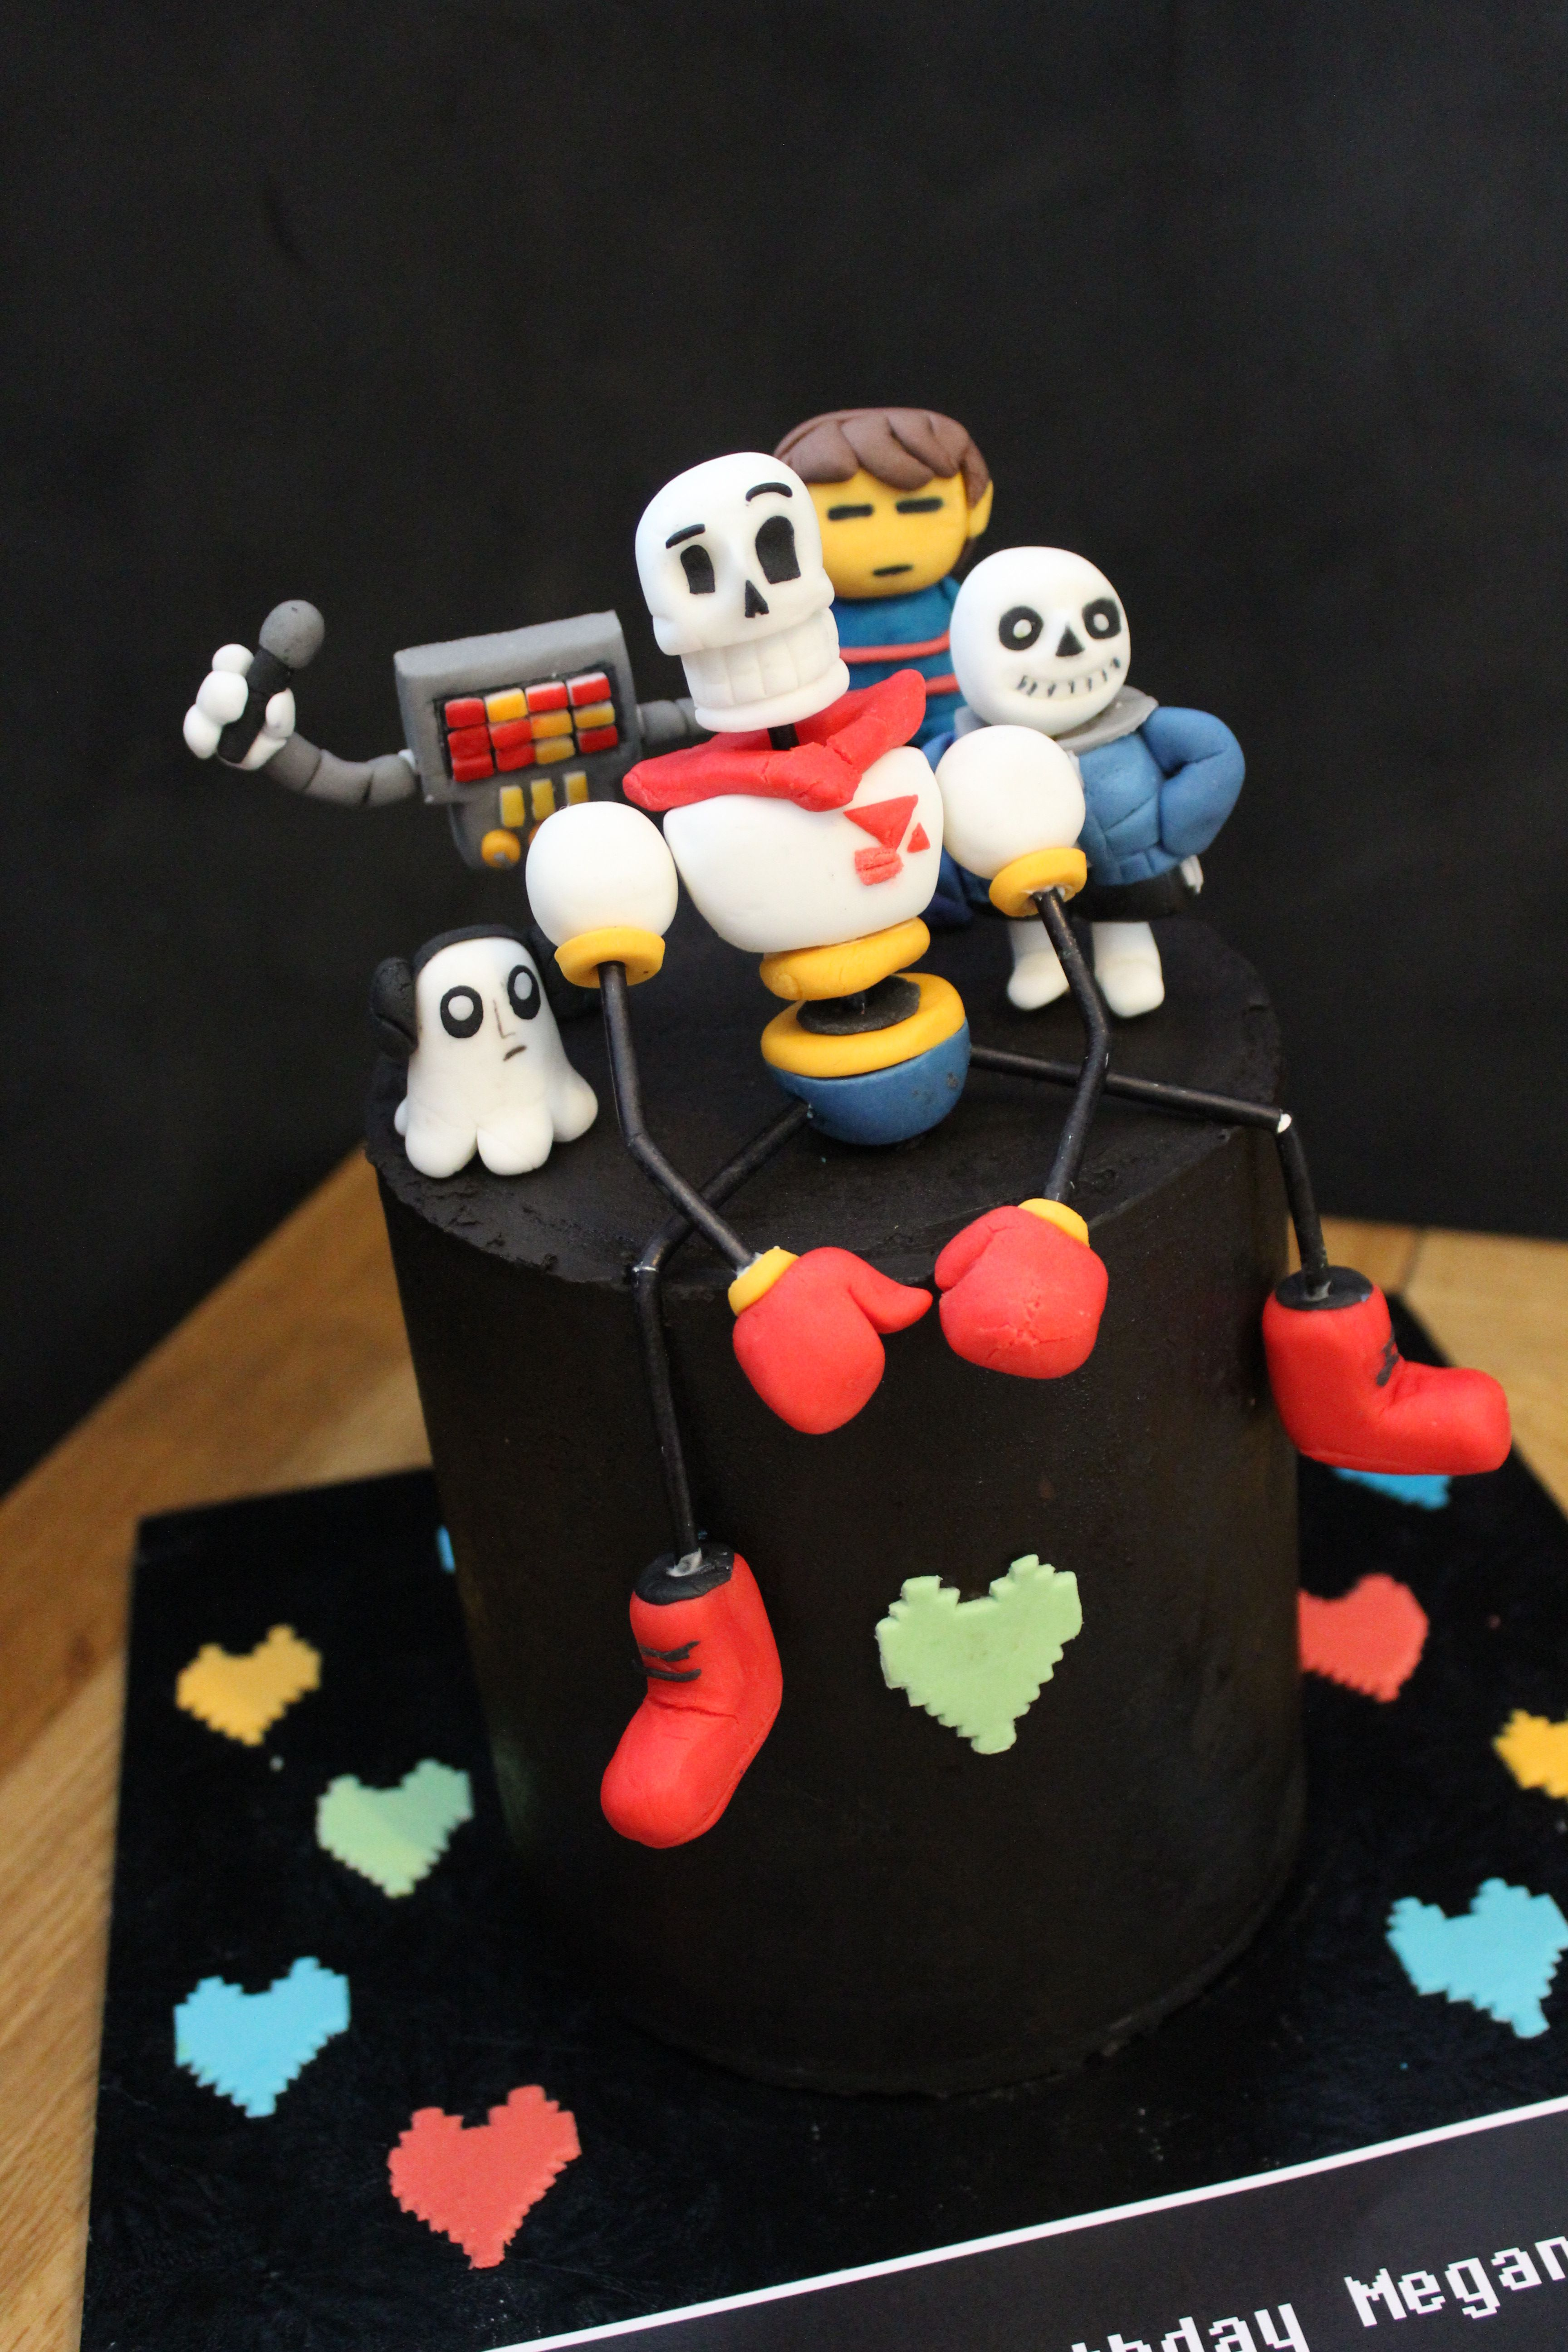 Undertale Birthday Cake With Papyrus Metatron Frisk